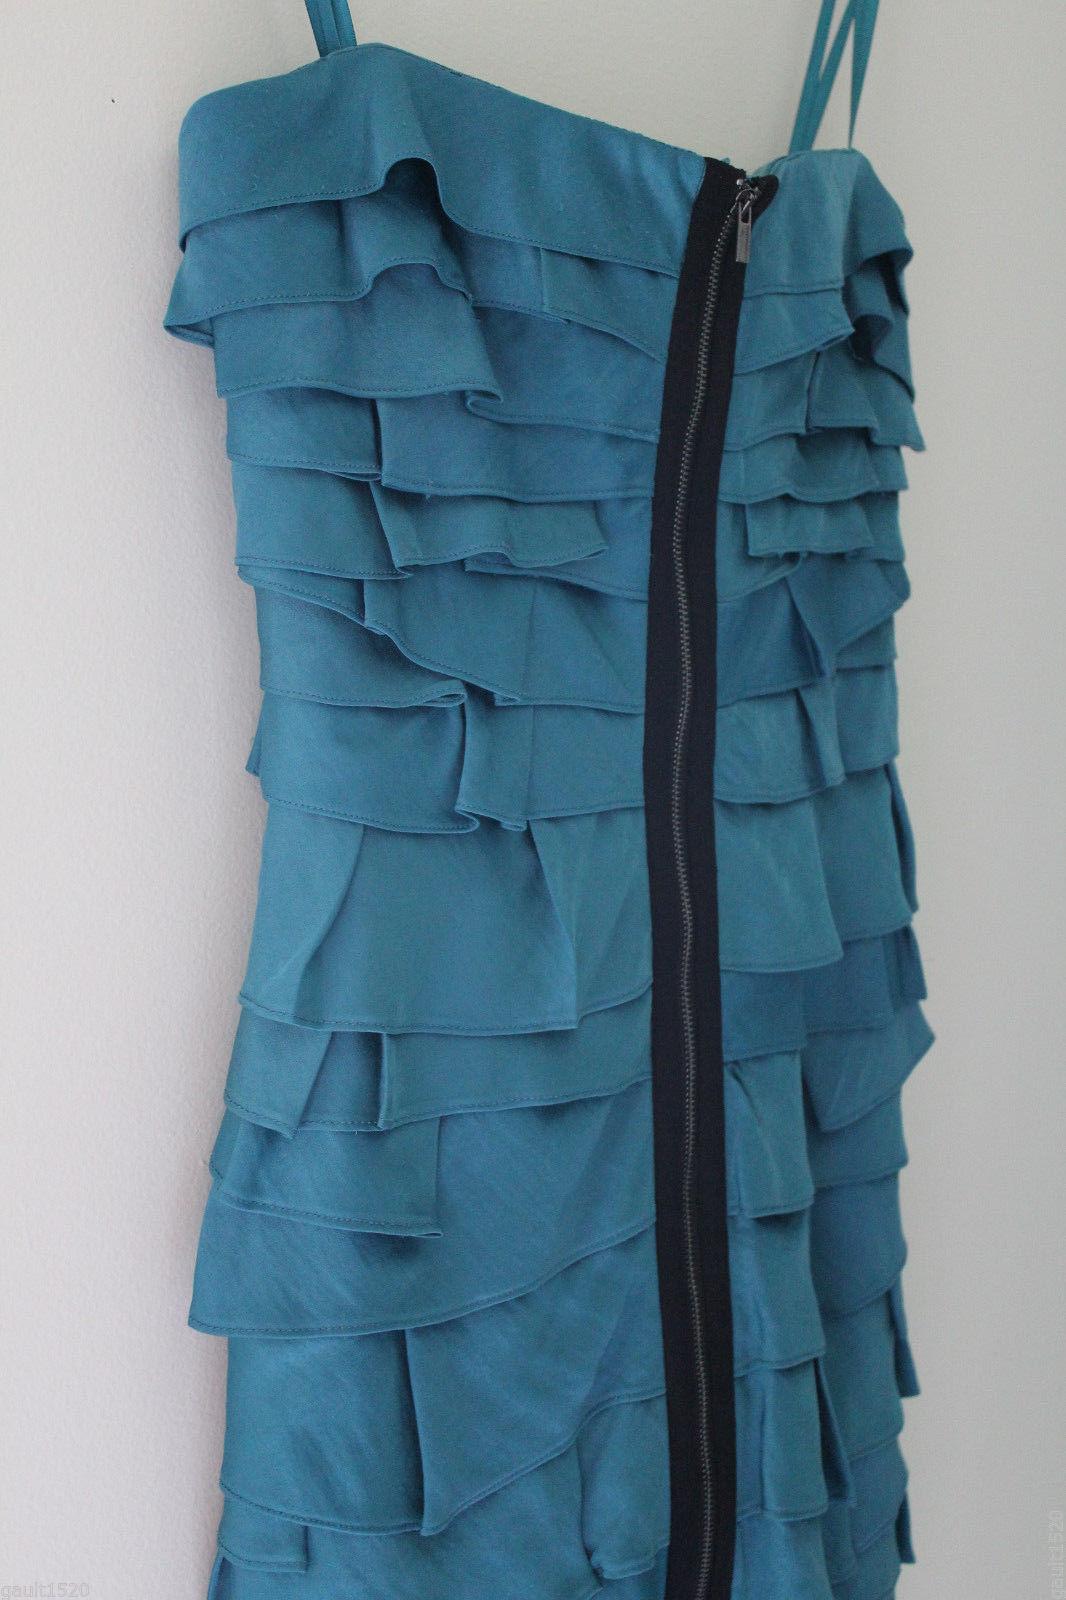 NEW BCBG Max Azria Tahiti Blue Brandie Convertible Tiered Strapless Dress 4 $248